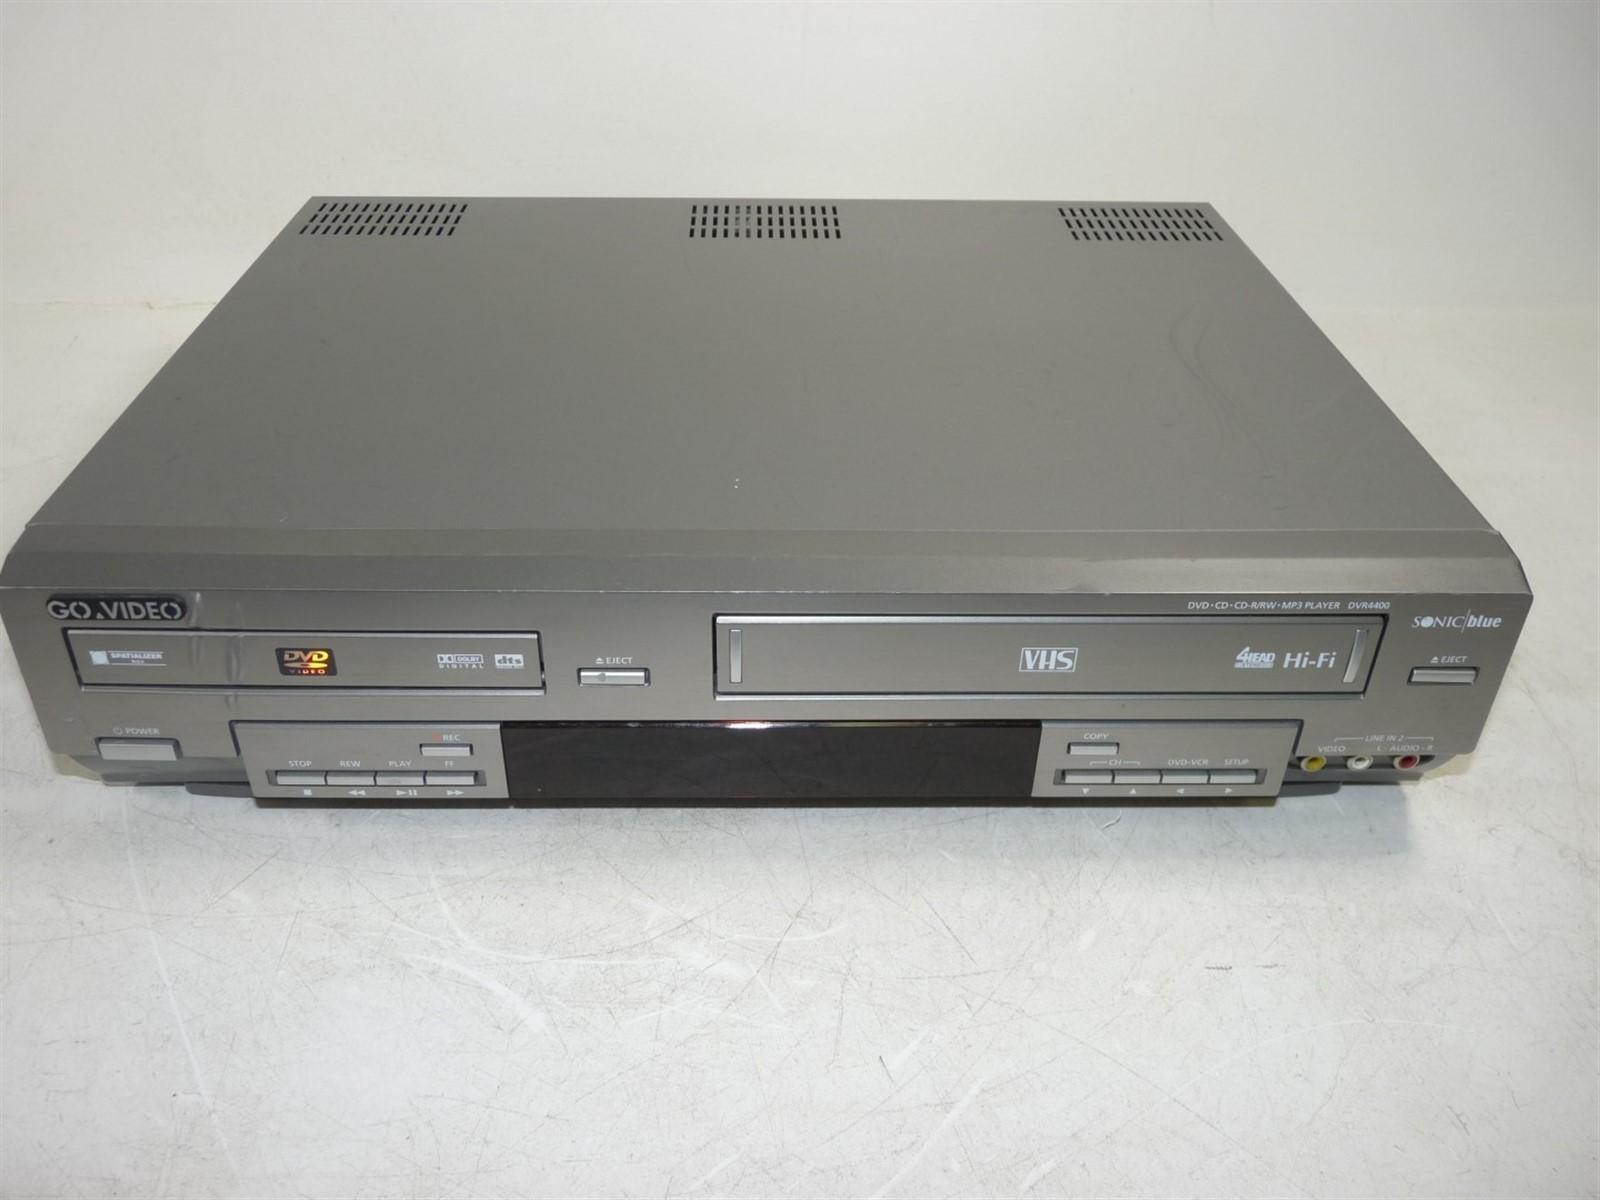 go video dvr4400 dvd vcr combo player limited testing as is ebay rh ebay com